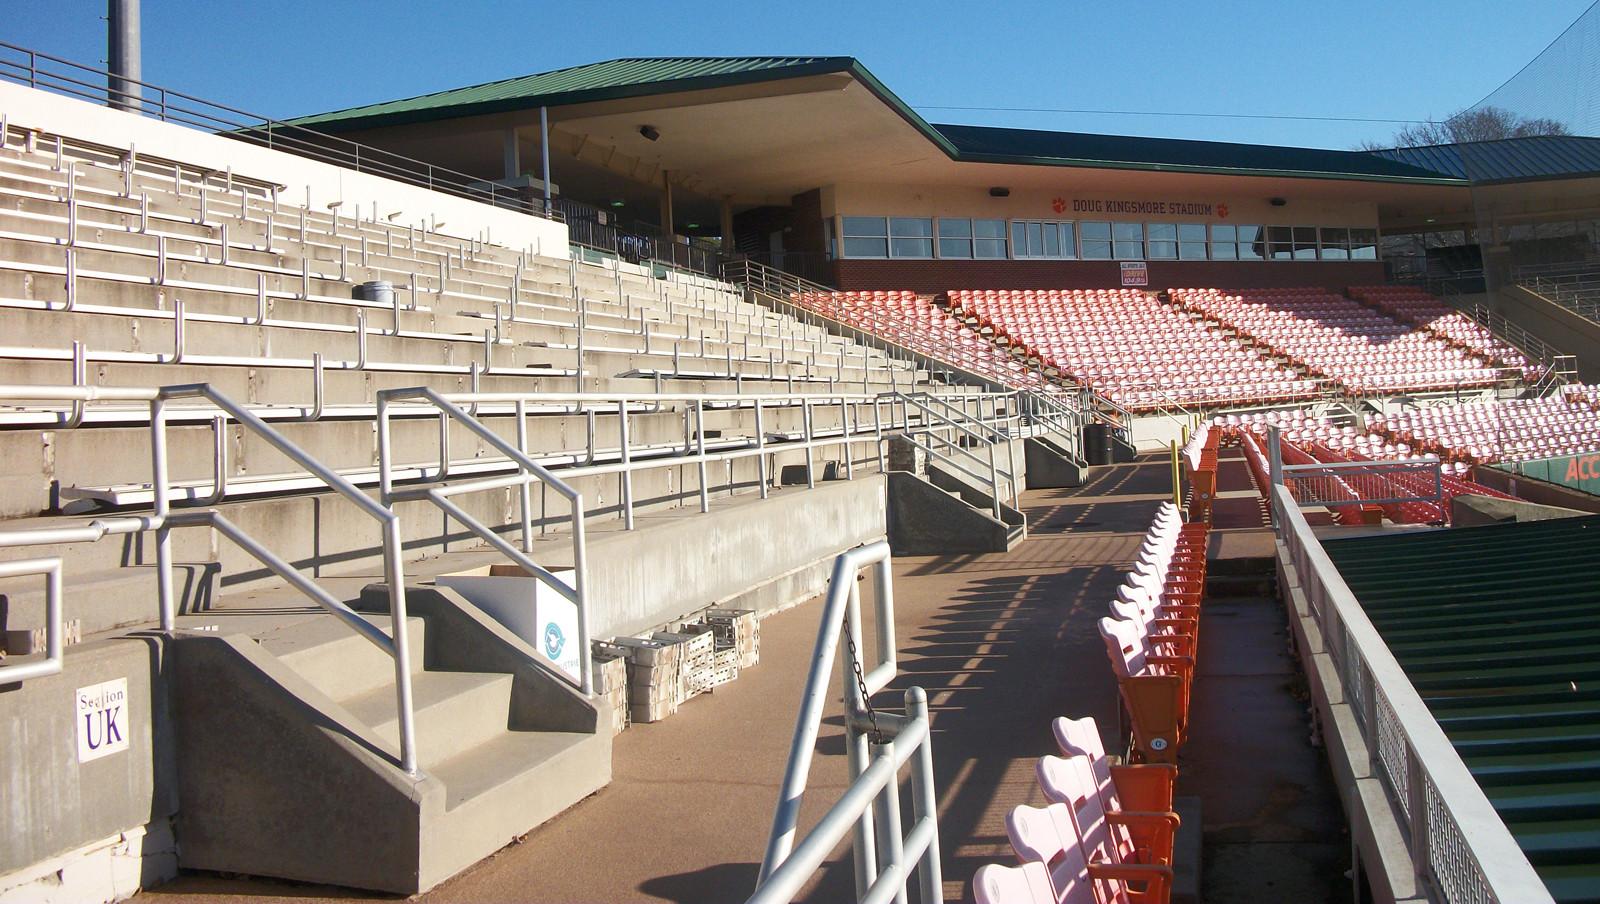 Clemson Baseball Video Report: Kingsmore Stadium Renovation Update